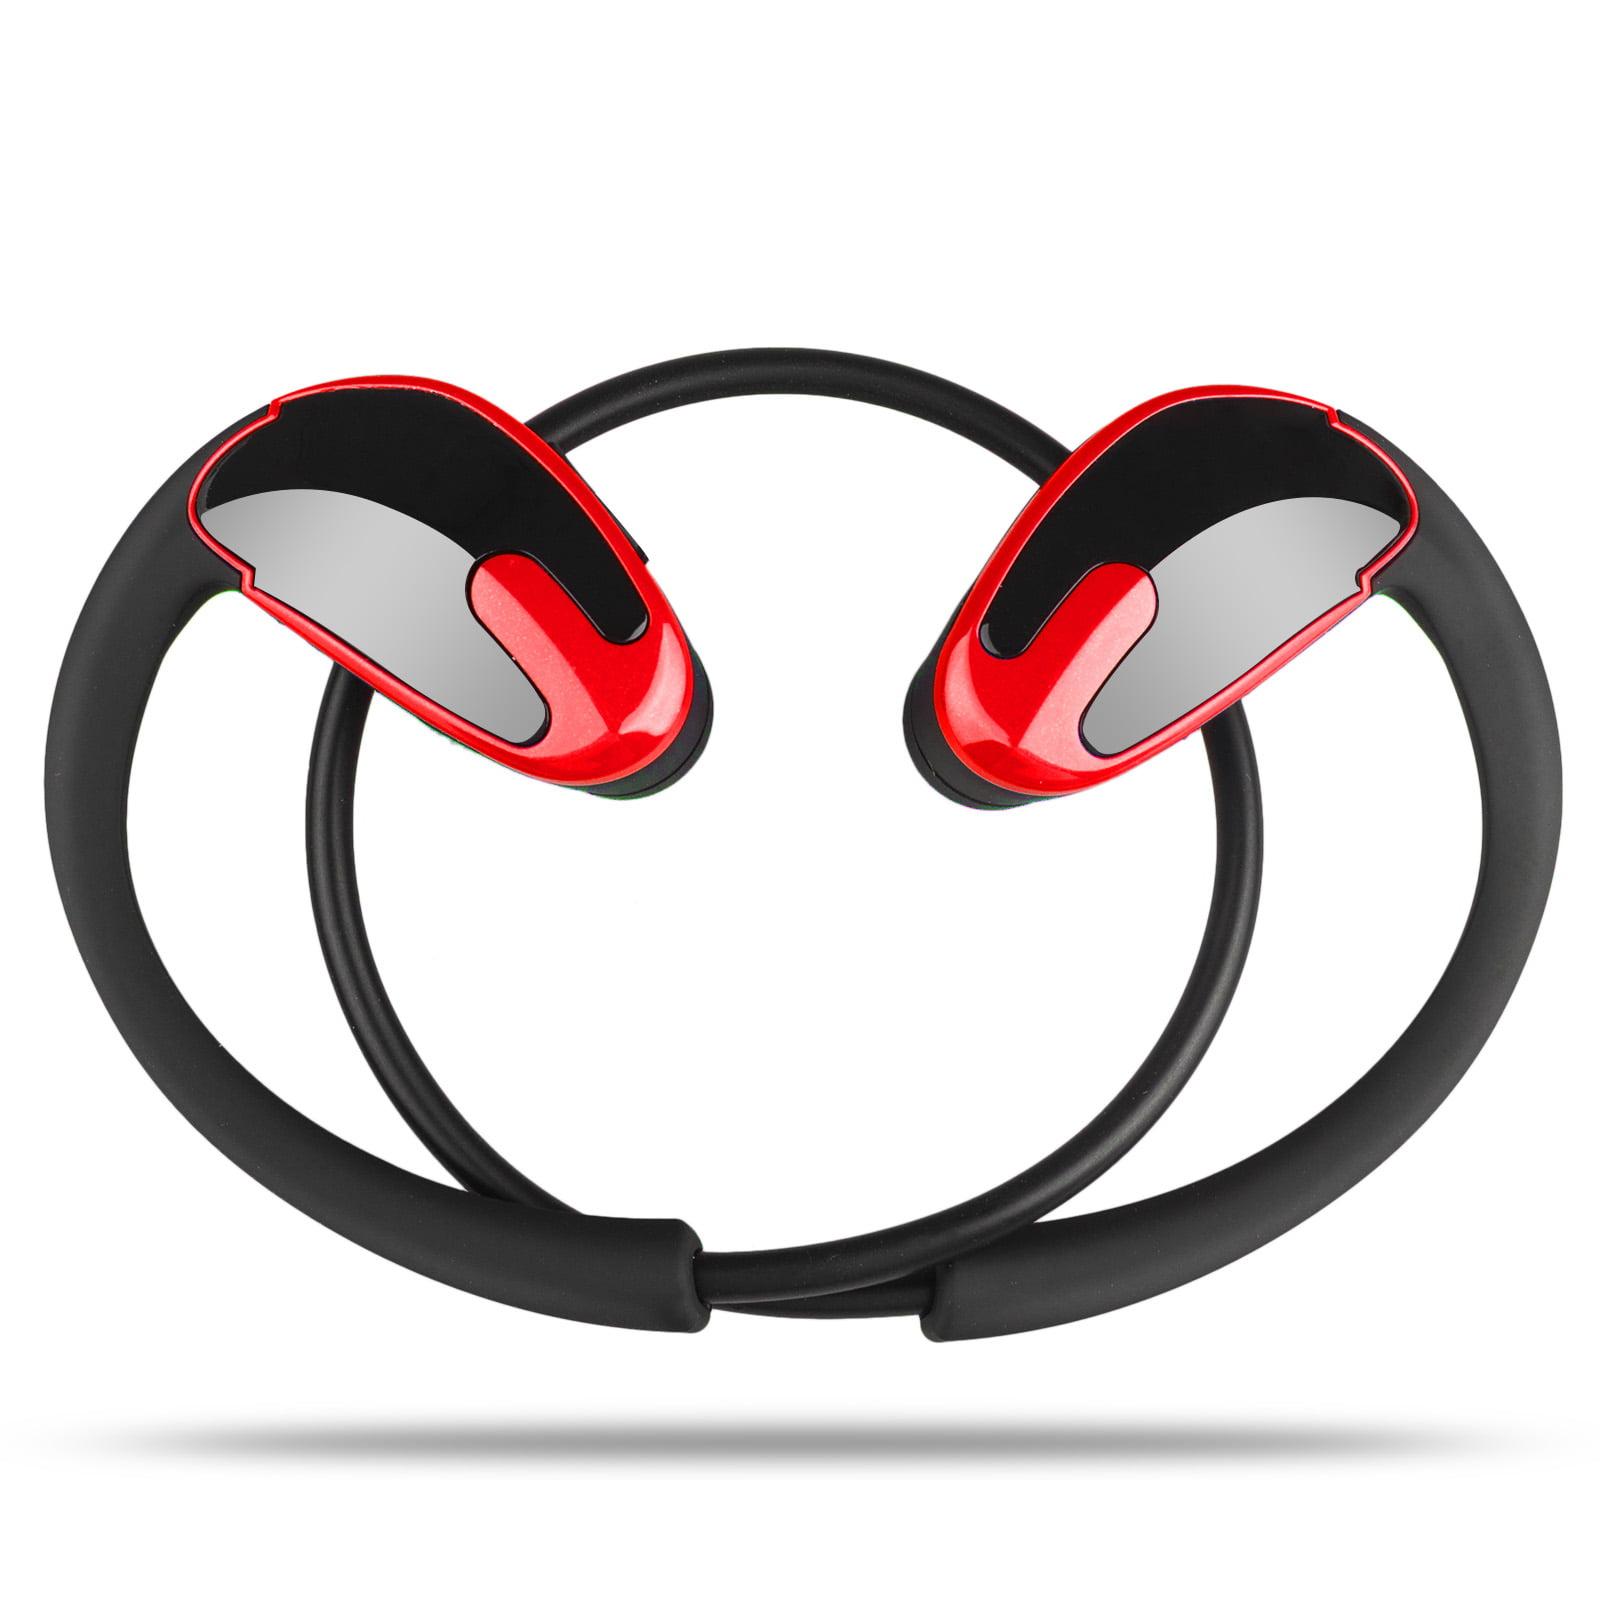 Wireless Music Headphones, EEEKit Mini Bluetooth 4.1 Stereo Earphones Hand-Free In-Ear Auto-Rebound Headset with Mic for Smartphones Tablets